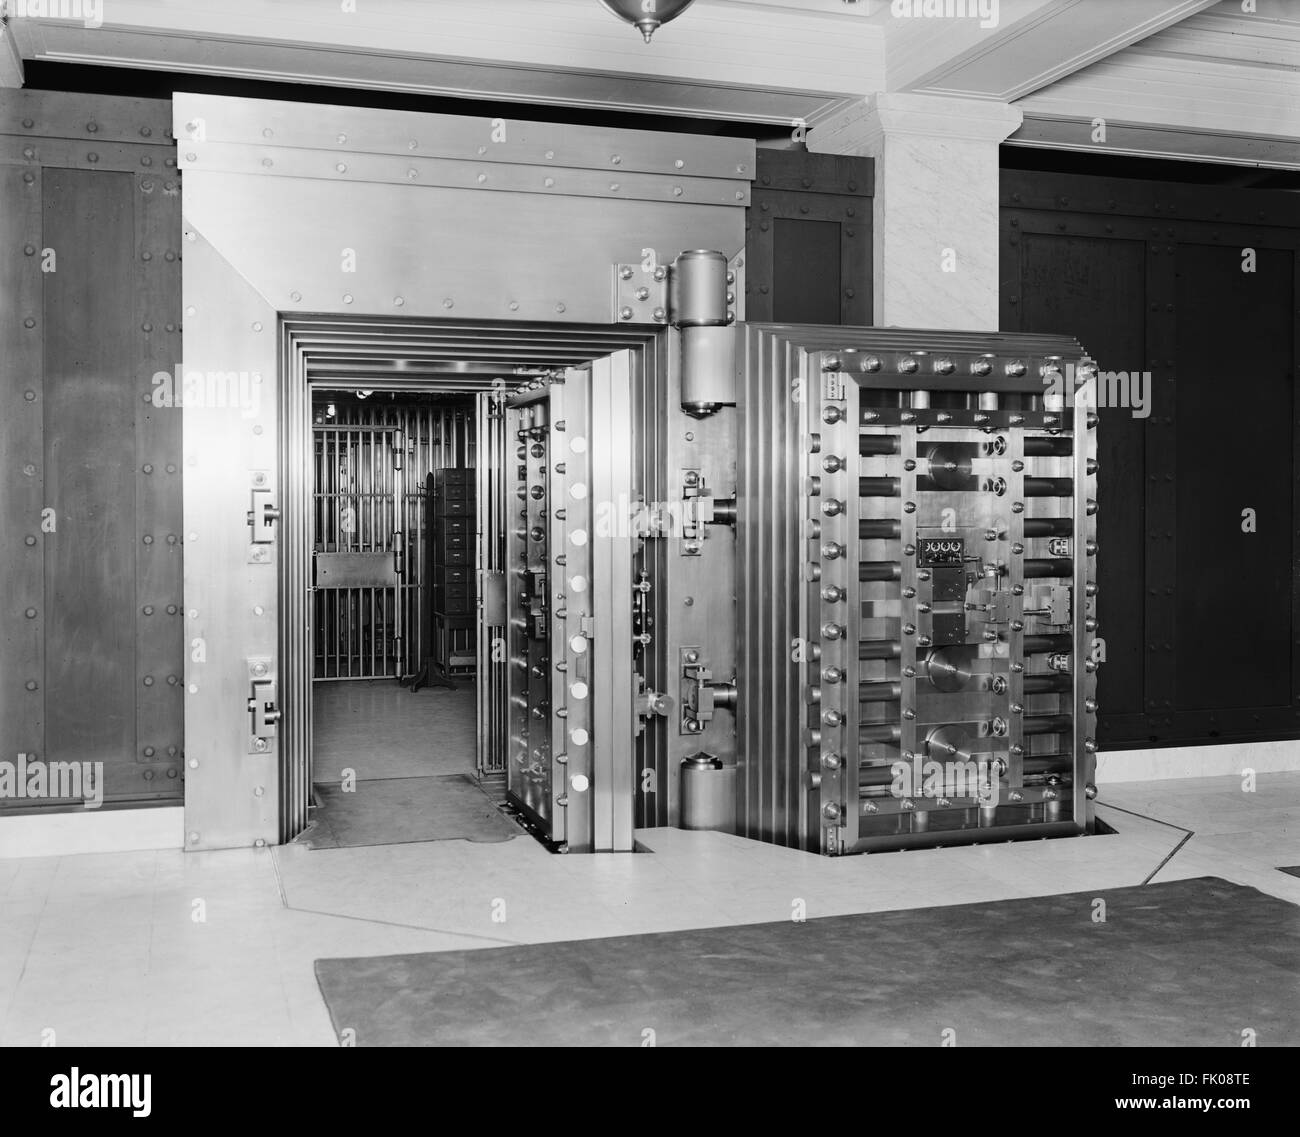 25-ton Door, Safe Deposit Vault, Old Colony Trust Company, Boston, Massachusetts, USA, circa 1915 - Stock Image